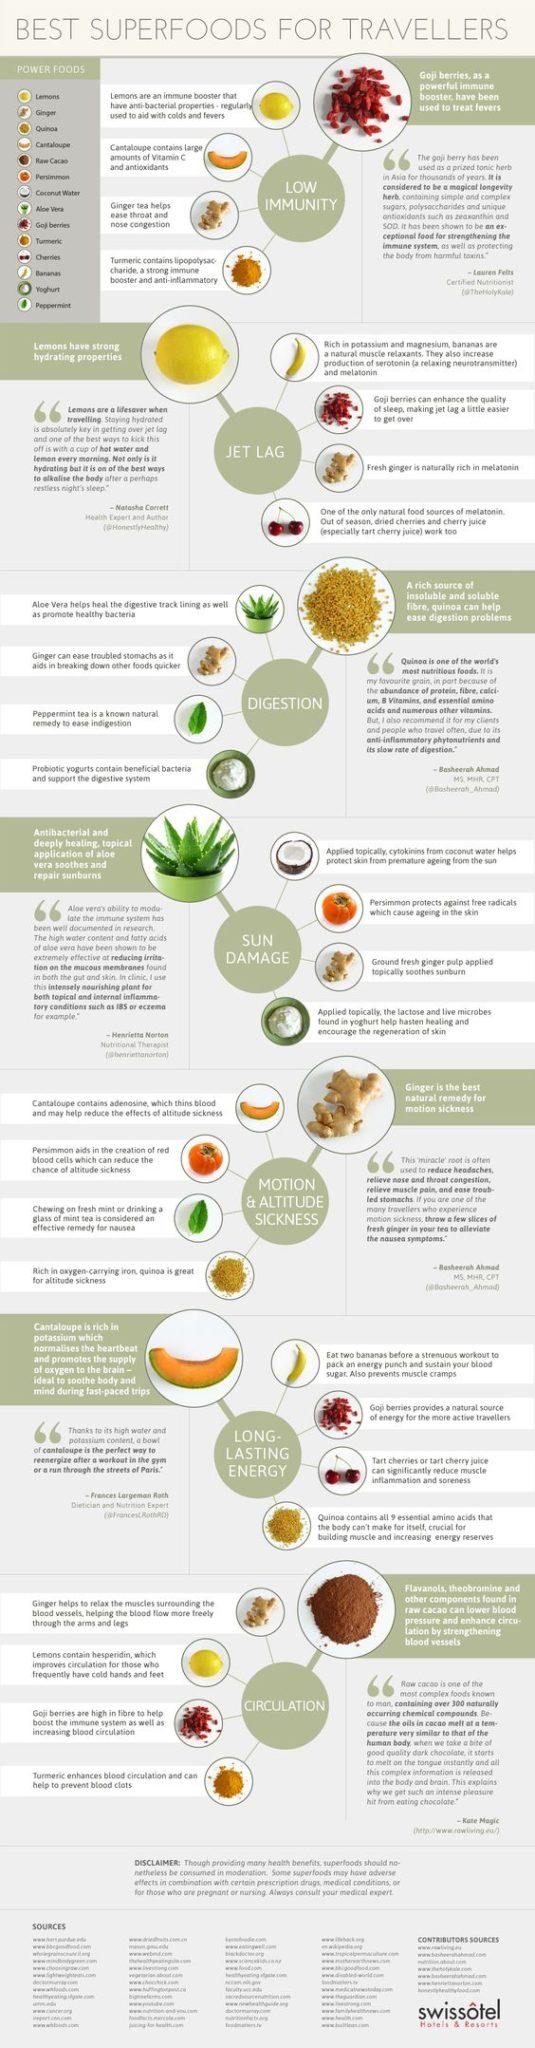 Top 5 Tips for Vegan Travel